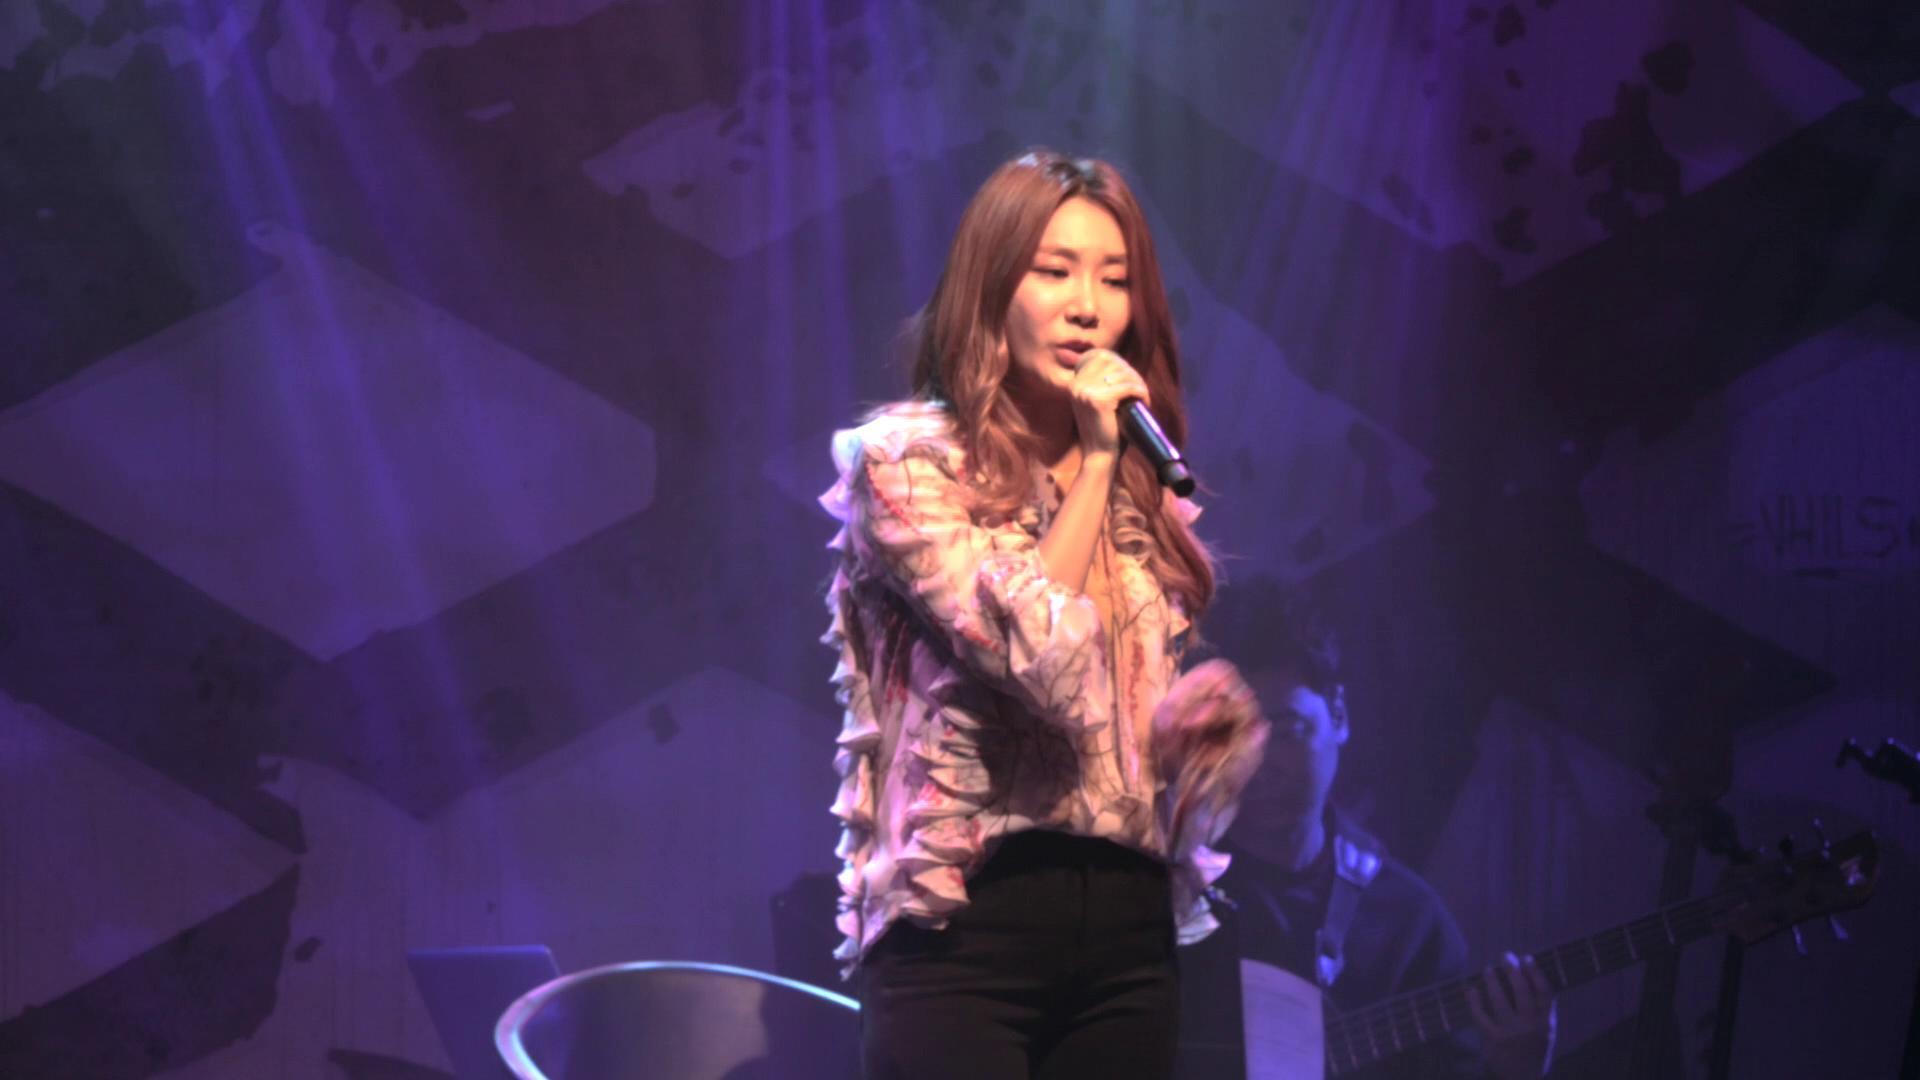 [Live] 제아 Jea - 한 여름 밤의 꿈 One Summer Night